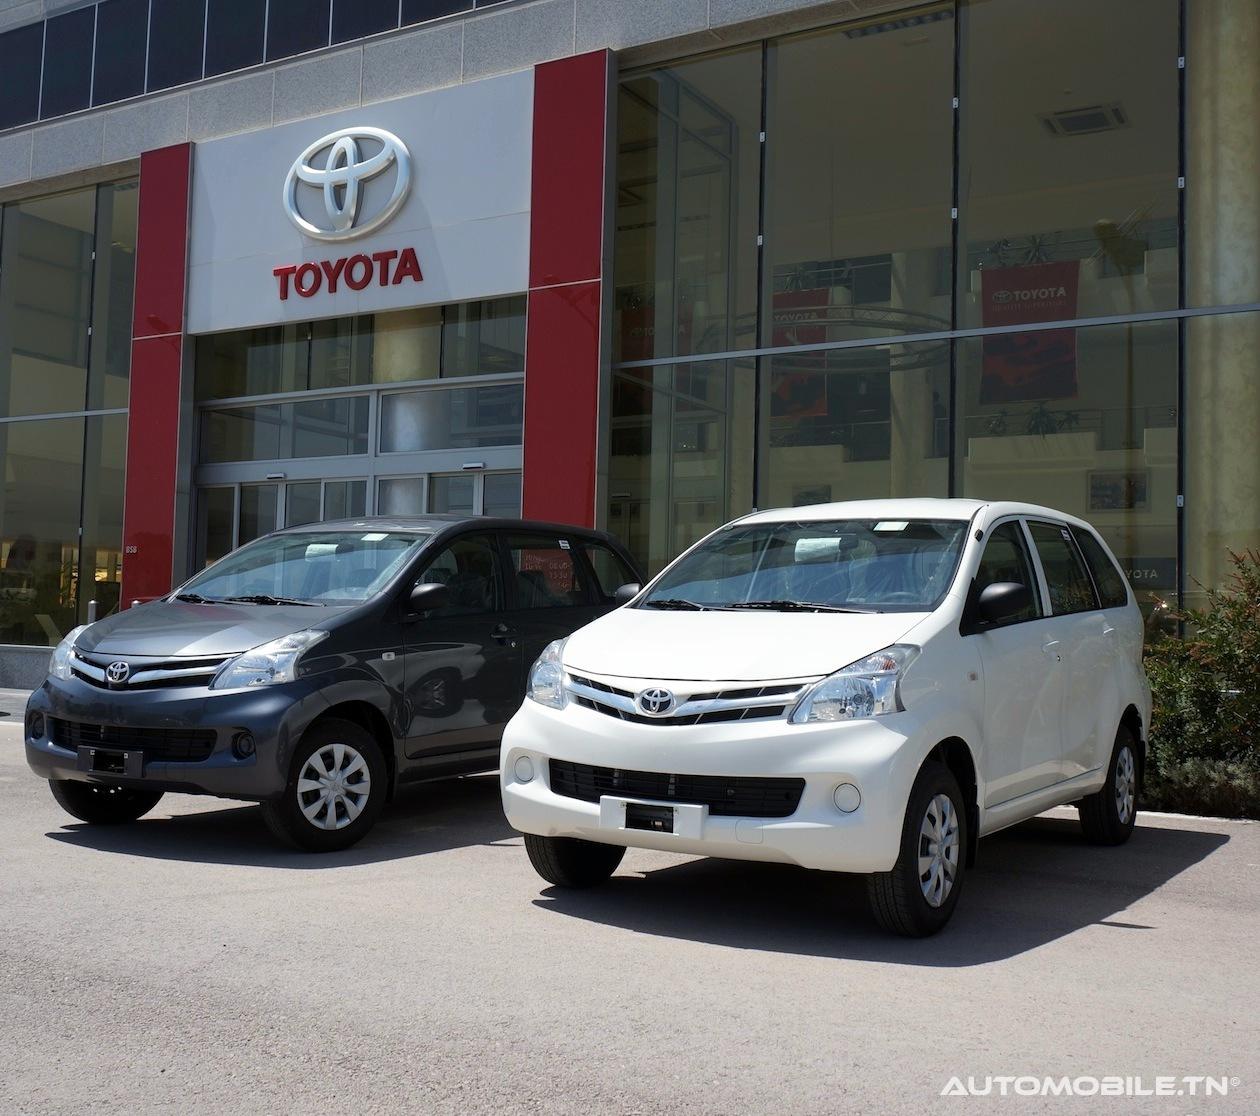 Mazda 4 4 tunisie prix